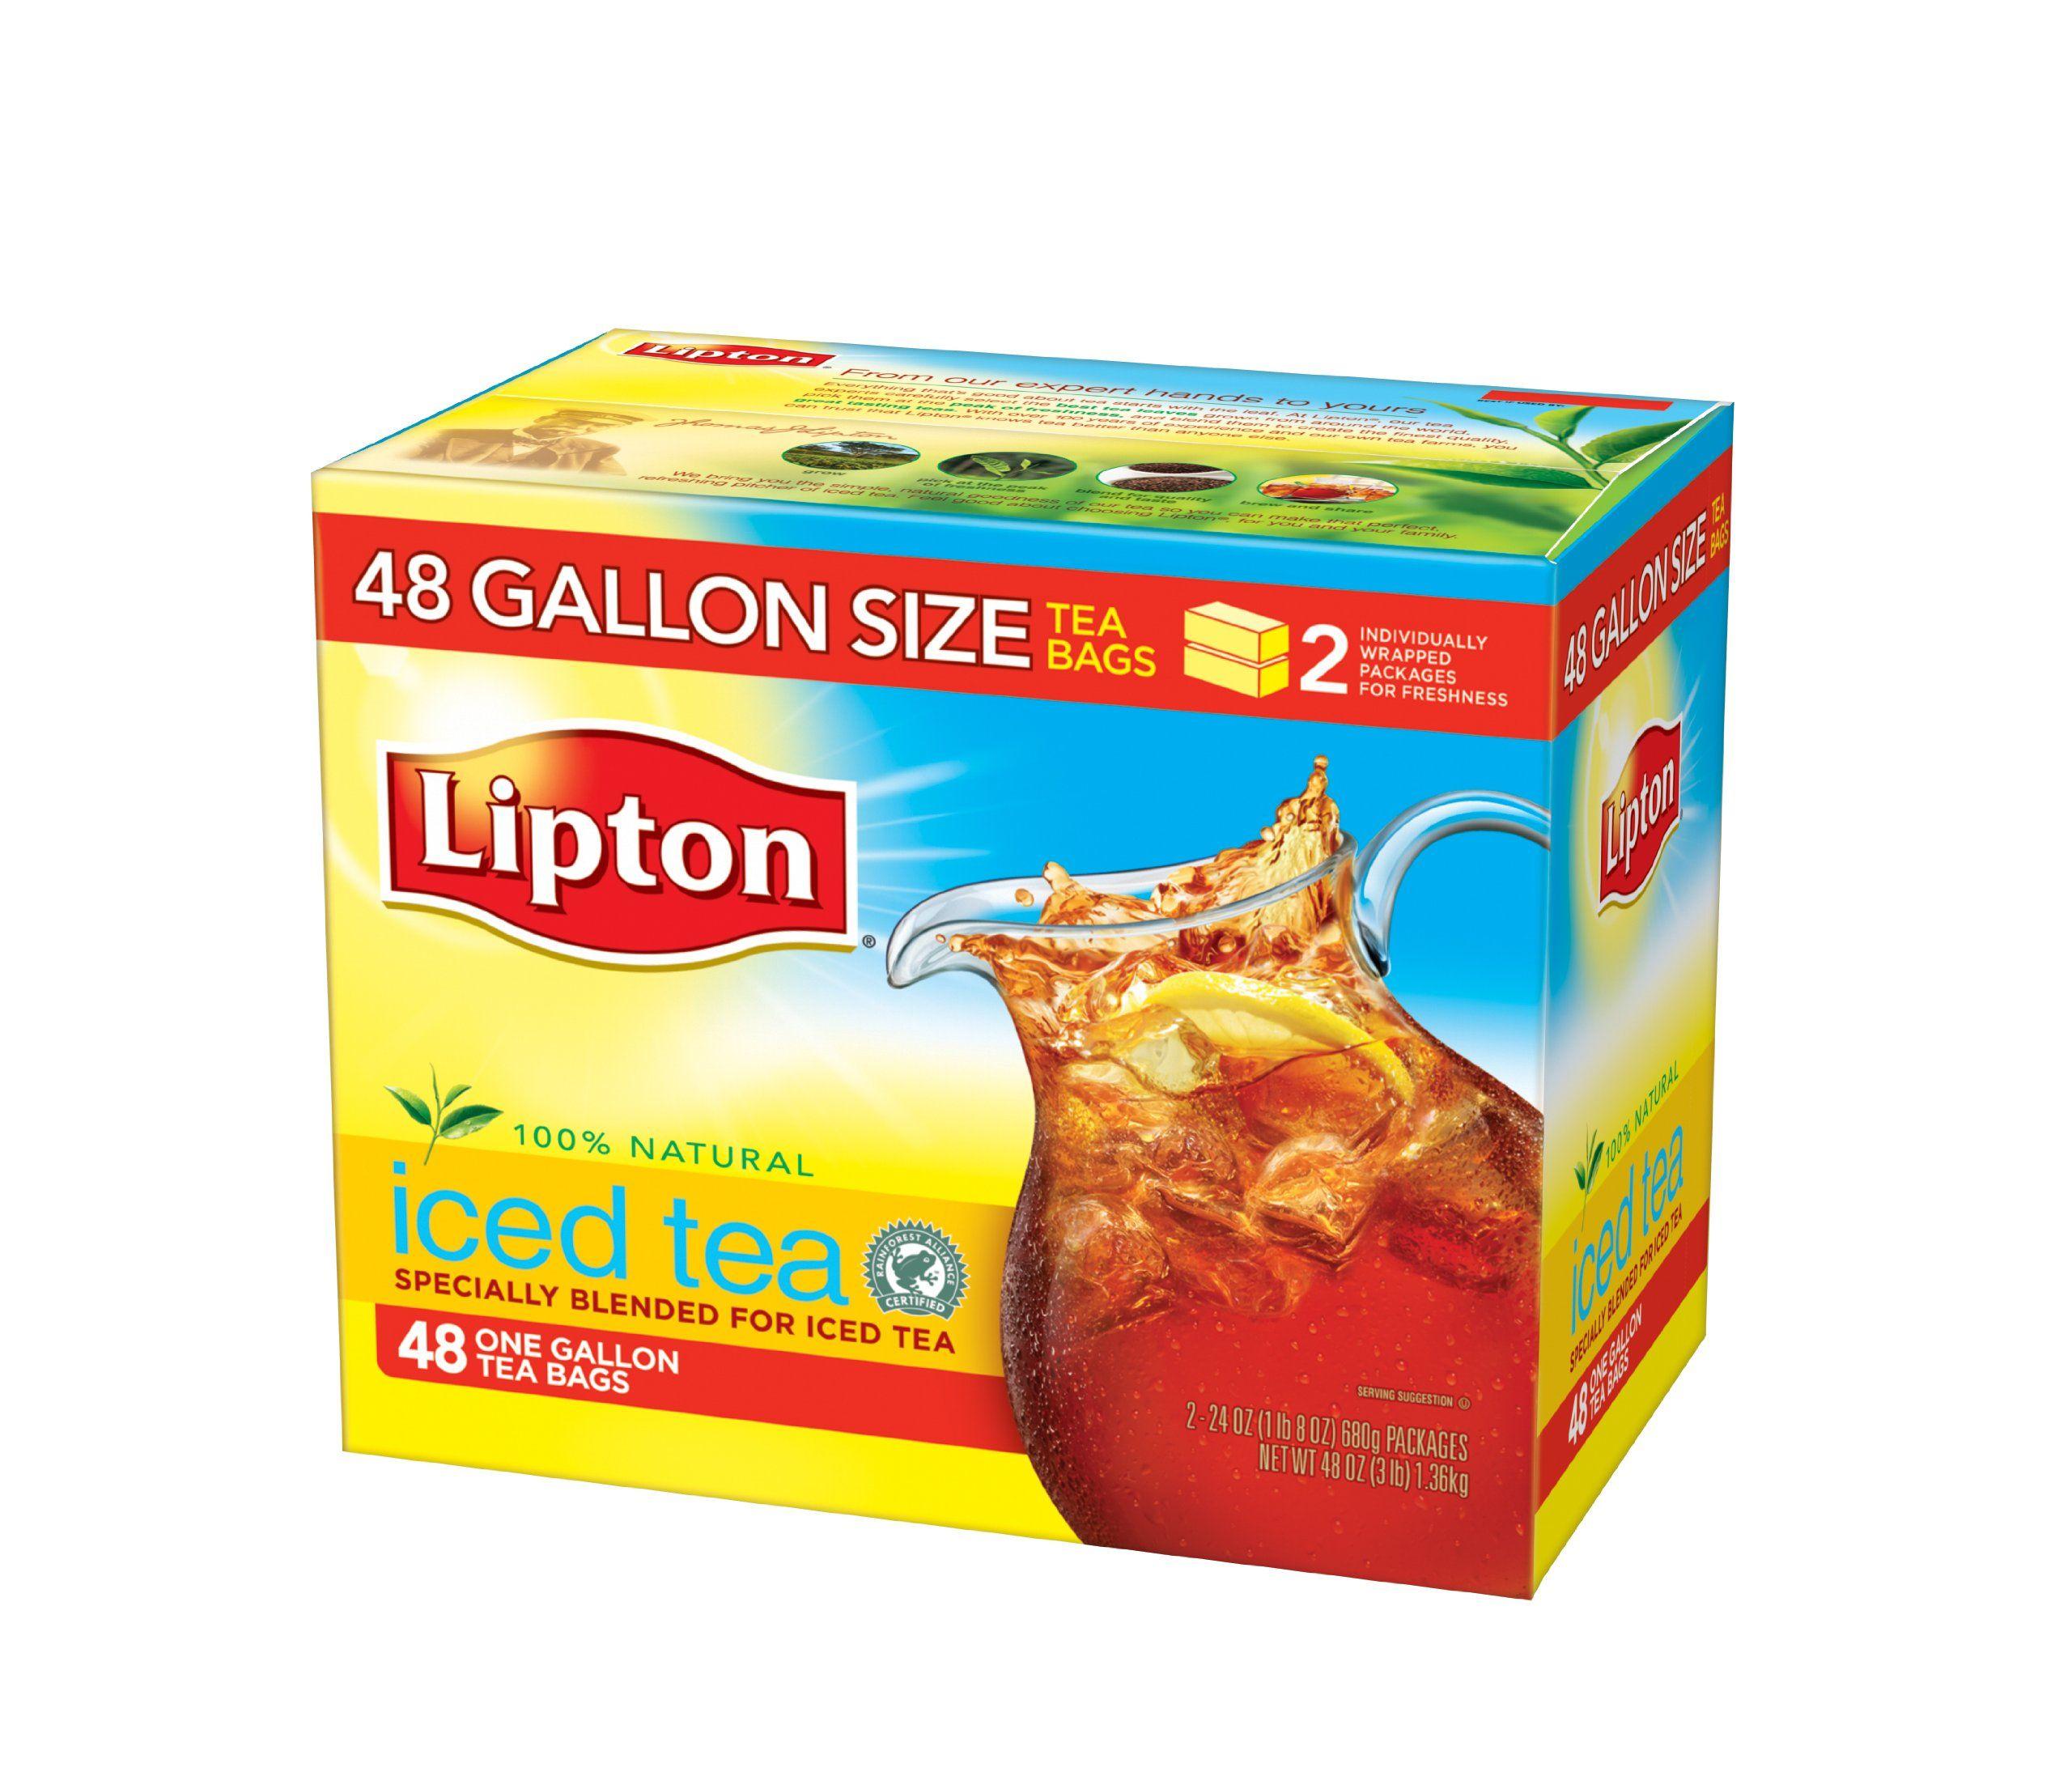 Lipton Iced Tea 48 One Gallon Size Bags